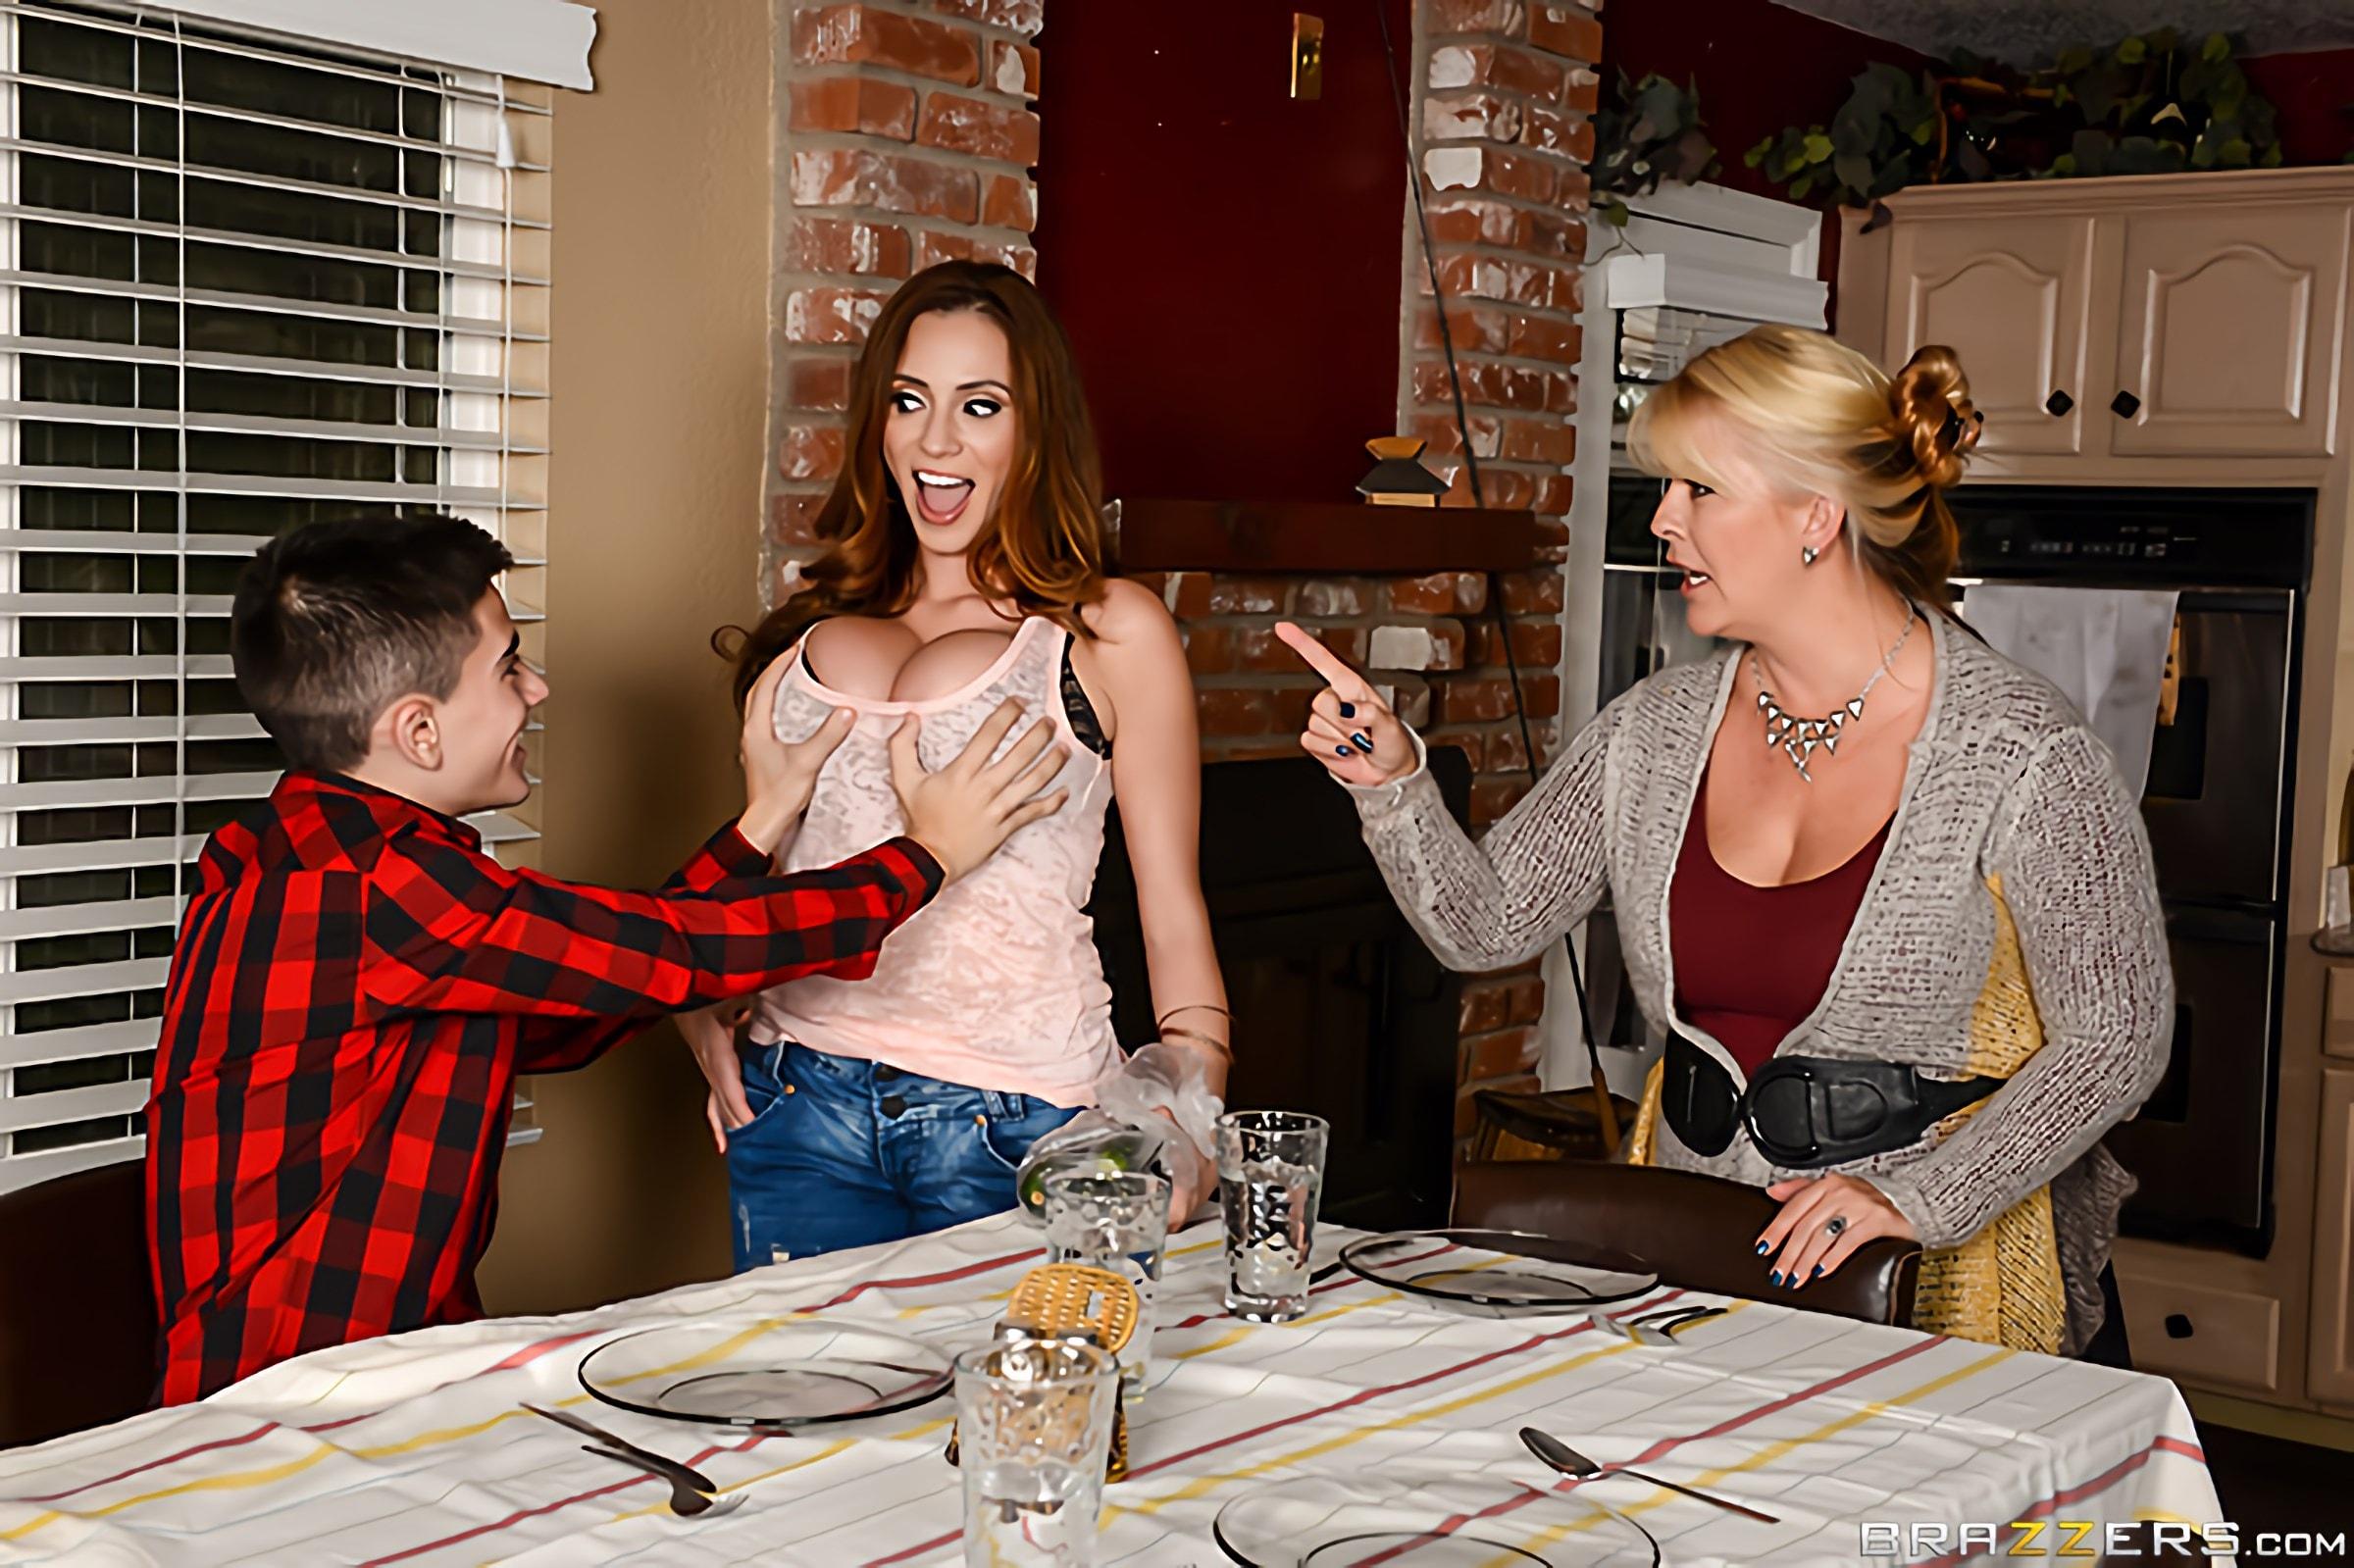 Brazzers 'Homemade American Tits' starring Ariella Ferrera (Photo 1)